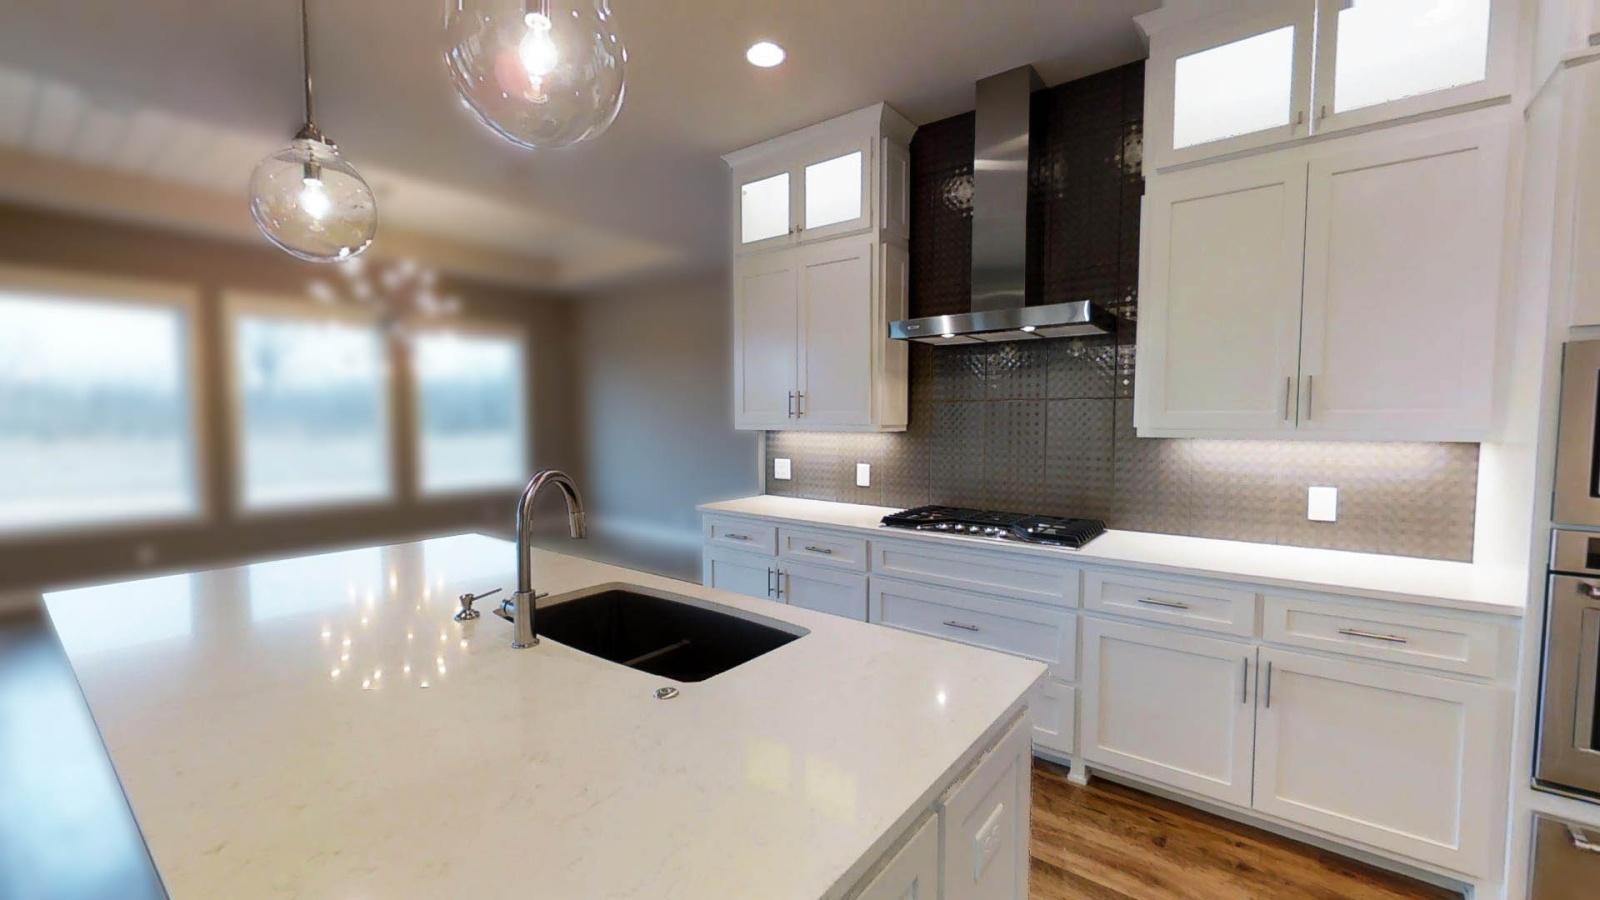 3 Bedrooms Bedrooms, ,3 BathroomsBathrooms,Custom Home,Home Plans,1010